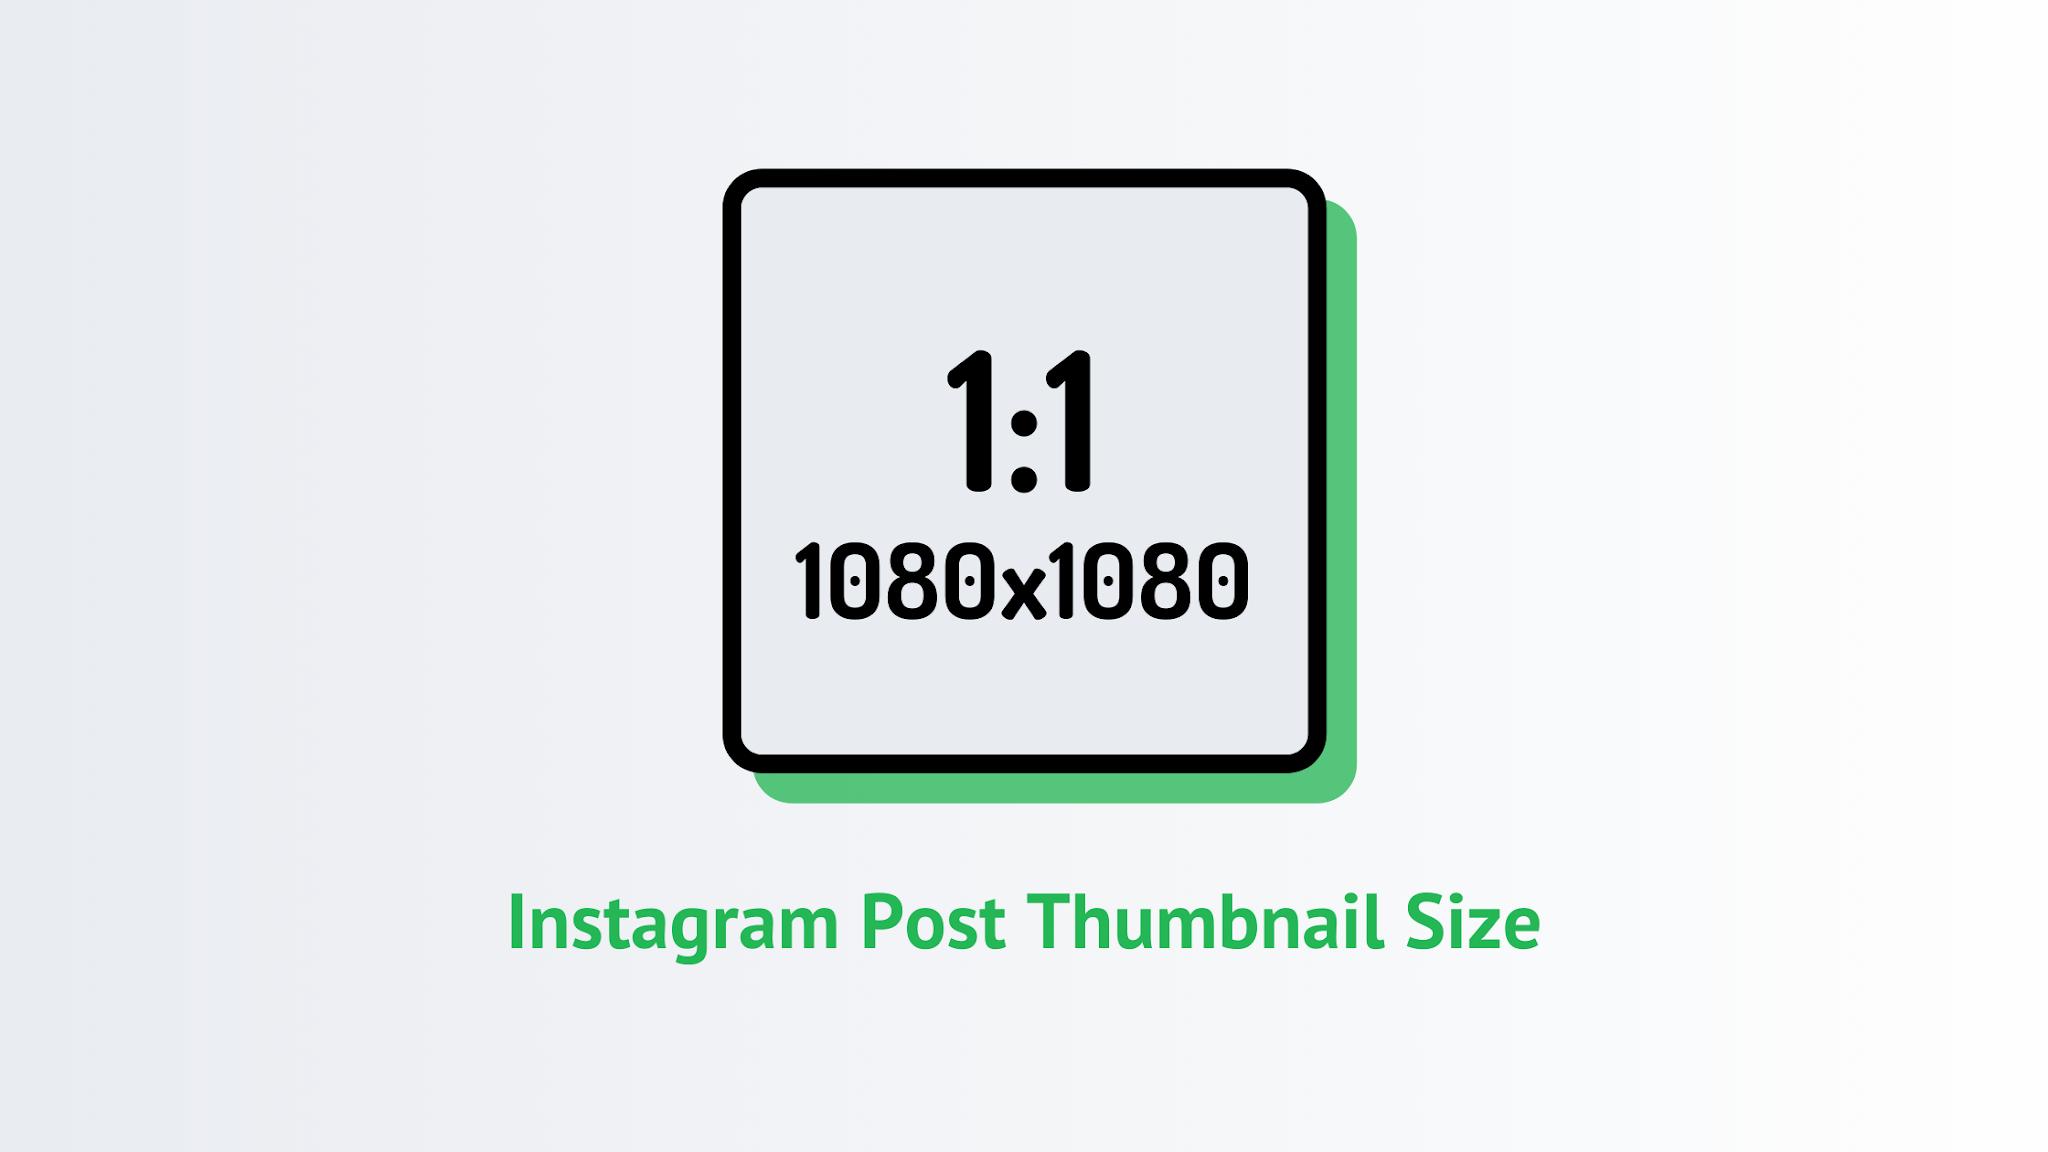 Instagram Post Thumbnail Size